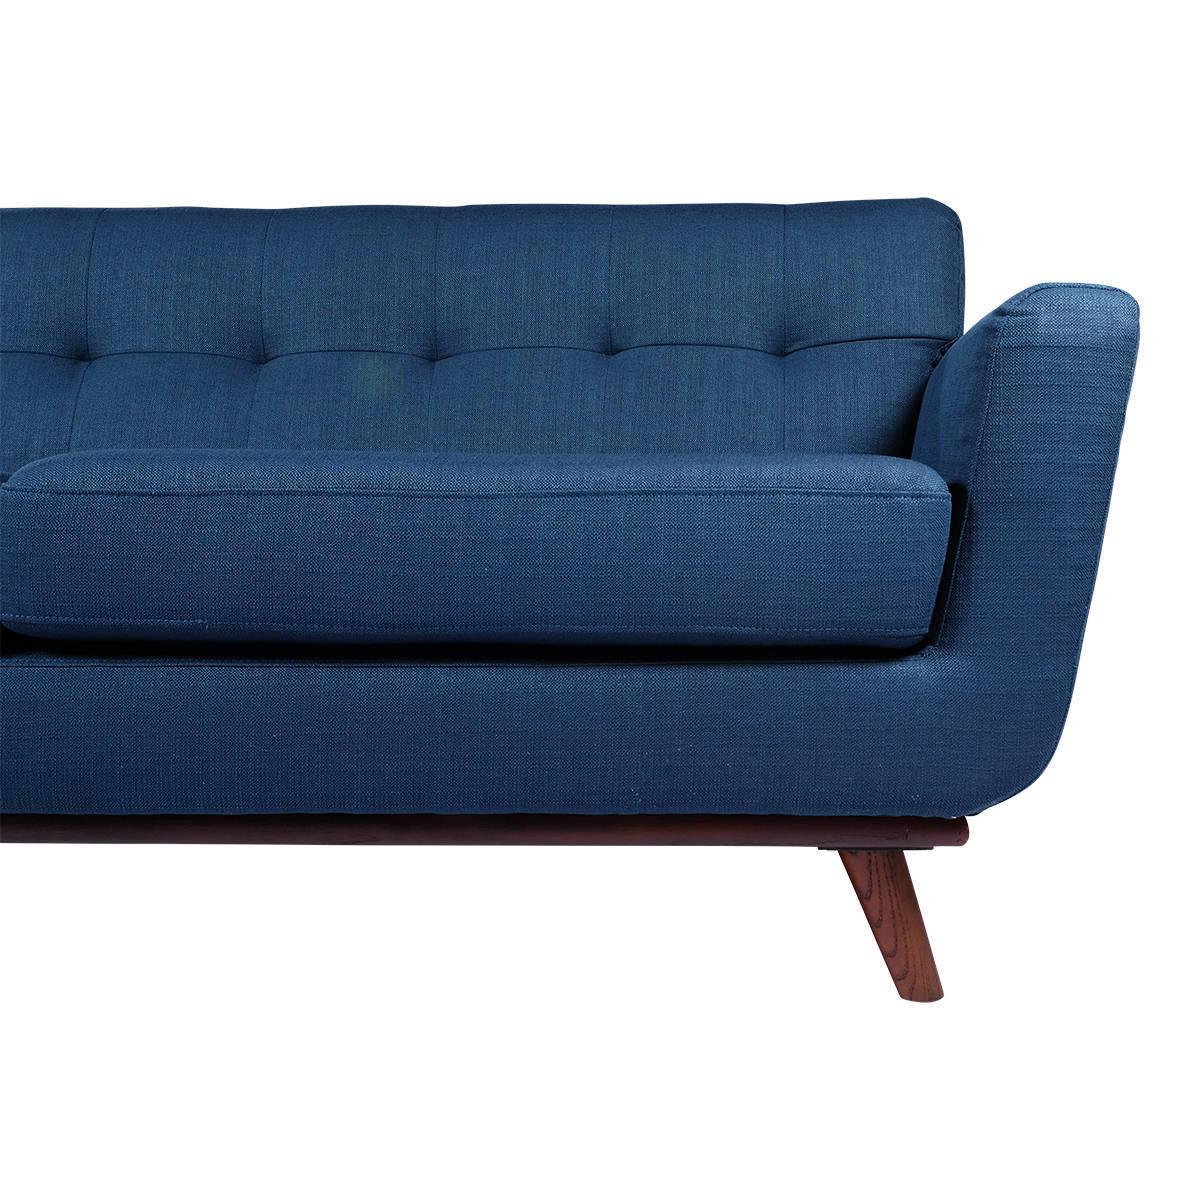 Beautiful Shop Retro Sofa   On Sale   Free Shipping Today   Overstock.com   12174714